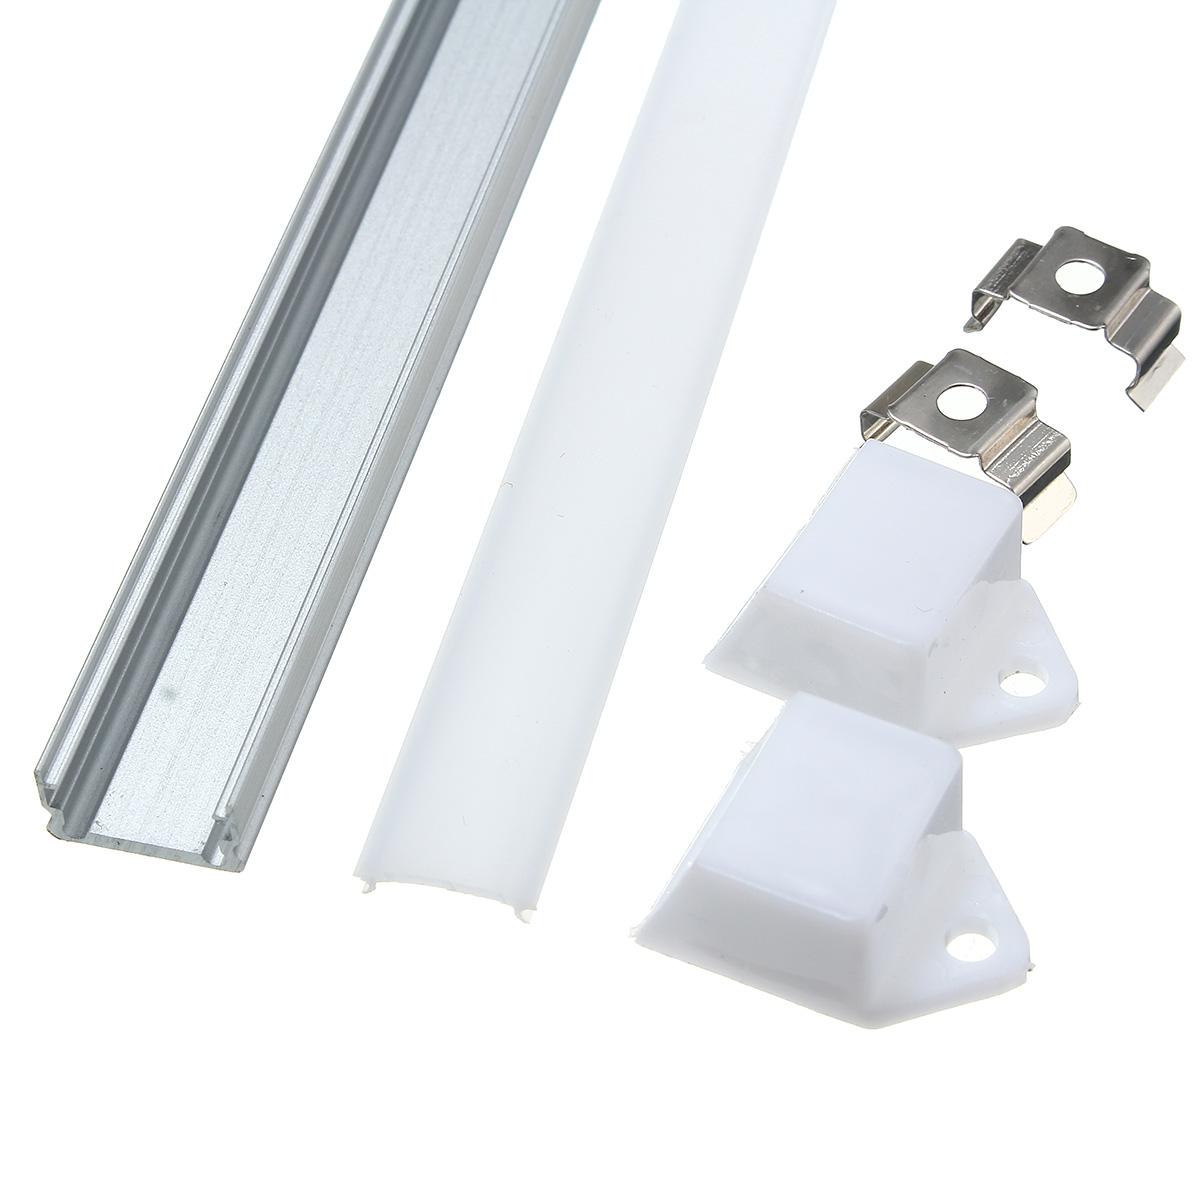 30cm Xh 008 U Style Aluminum Channel Holder For Led Strip